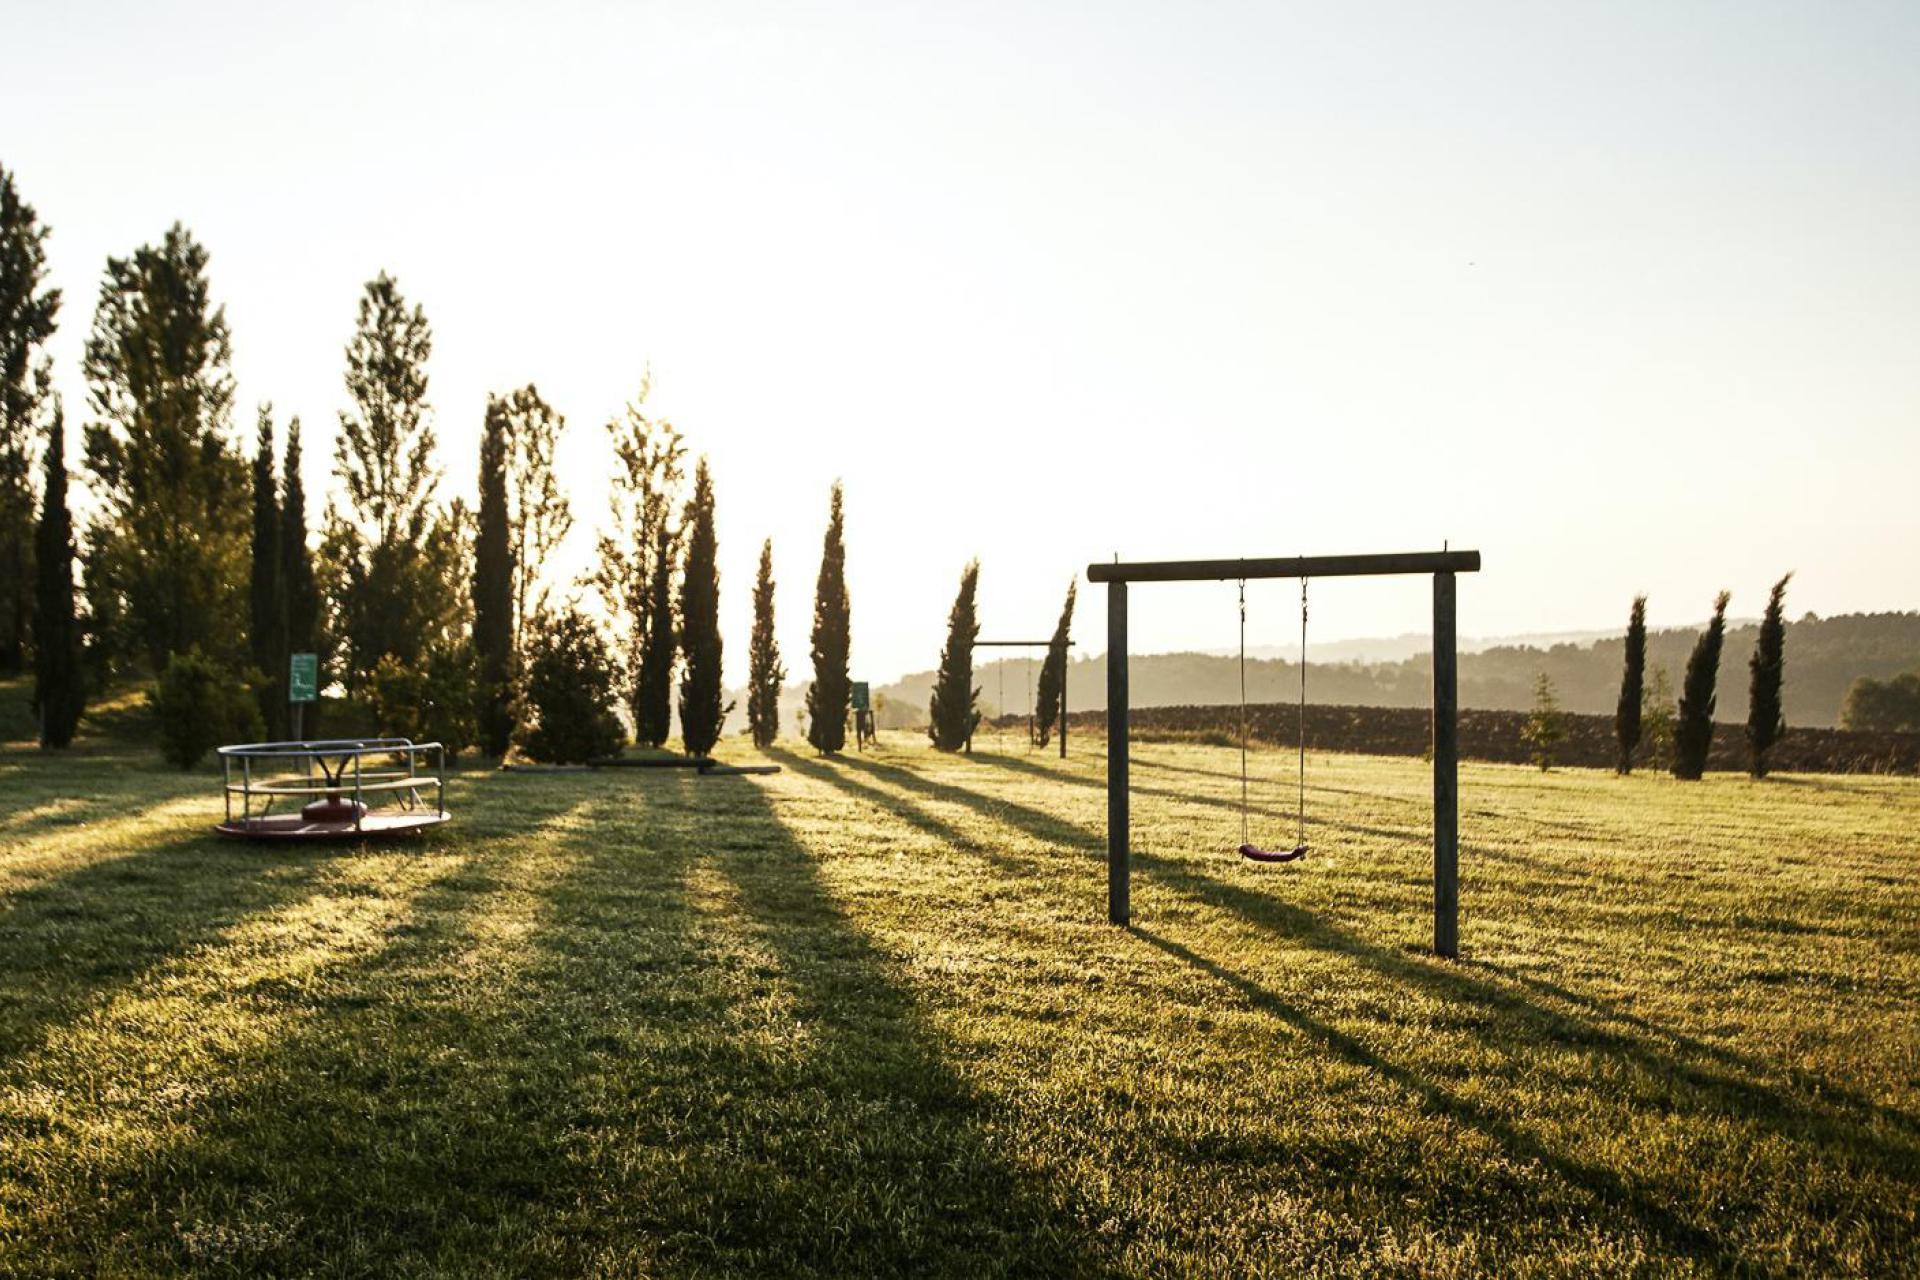 Agriturismo Toskana Kinderfreundlicher Agriturismo in der Toskana | myitalyselection.de